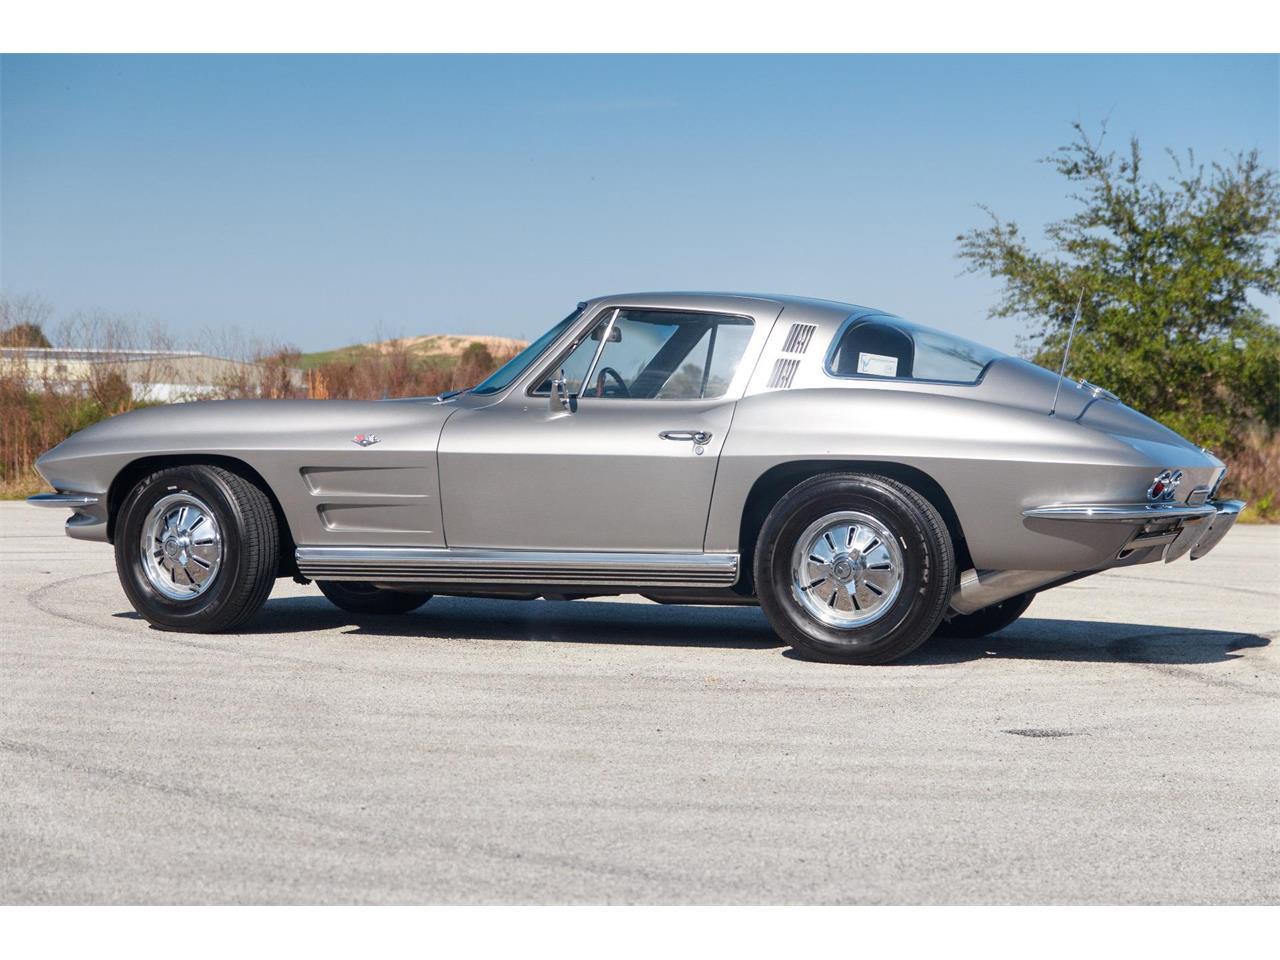 1964 Chevrolet Corvette Stingray (CC-1314402) for sale in Ocala, Florida